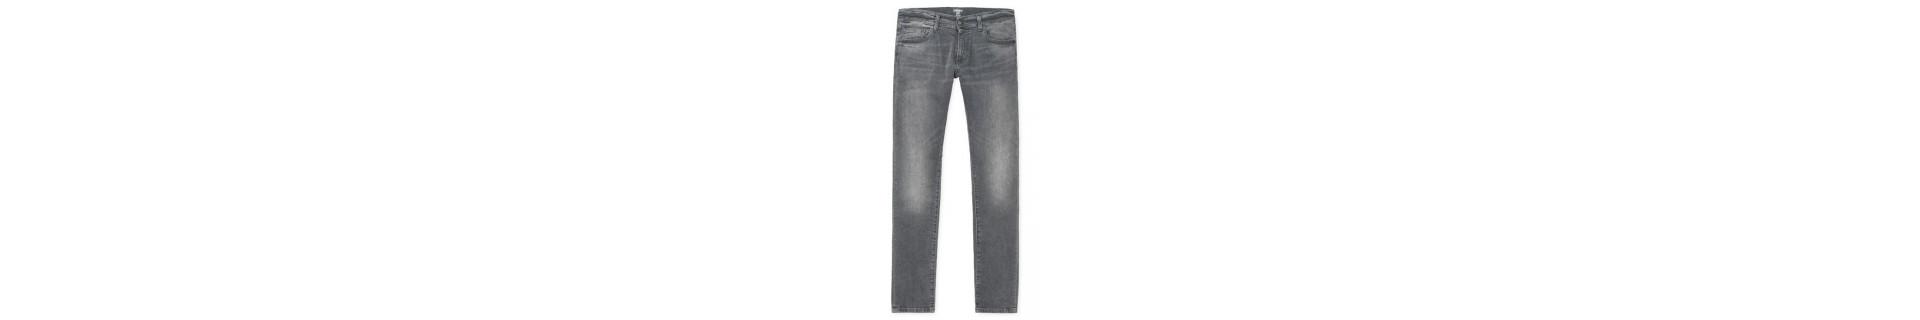 Pantalones, Jeans, Shorts para hombre marca Adidas, Champion, Carhartt, Ellese, Puma, Nike , Rebook, Scotch